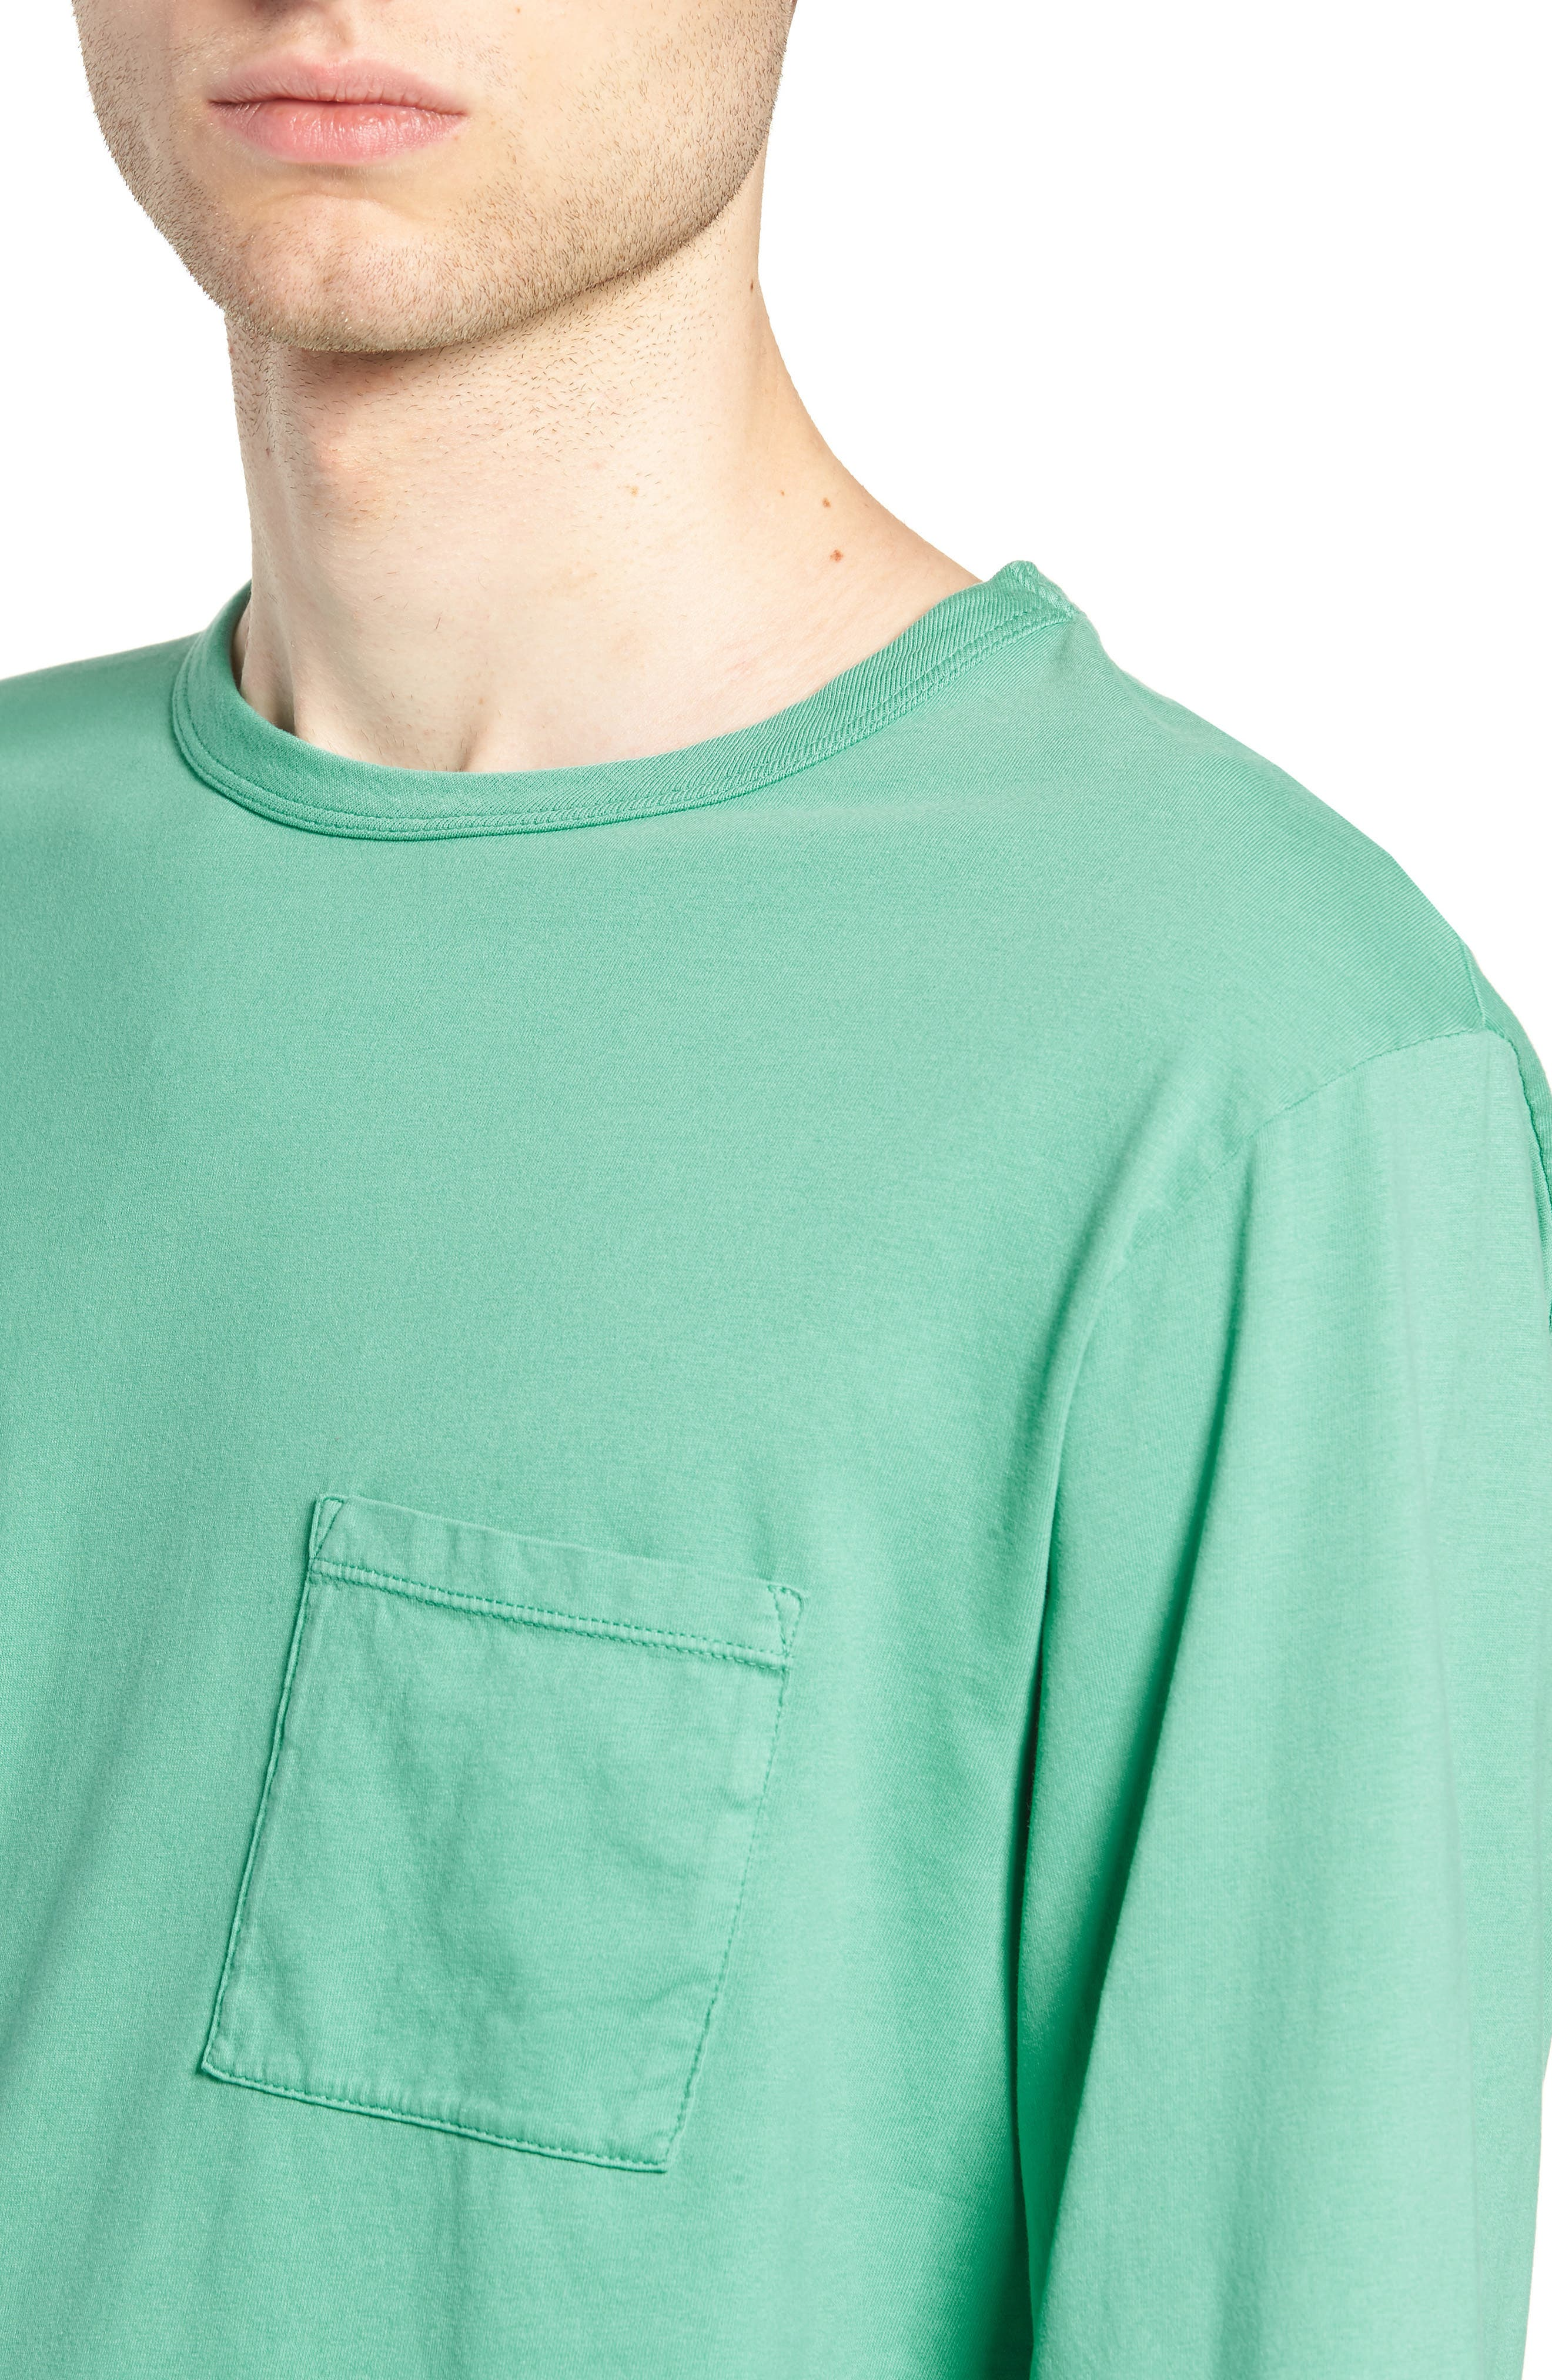 James Pima Long Sleeve Pocket T-Shirt,                             Alternate thumbnail 4, color,                             SEAFOAM GREEN